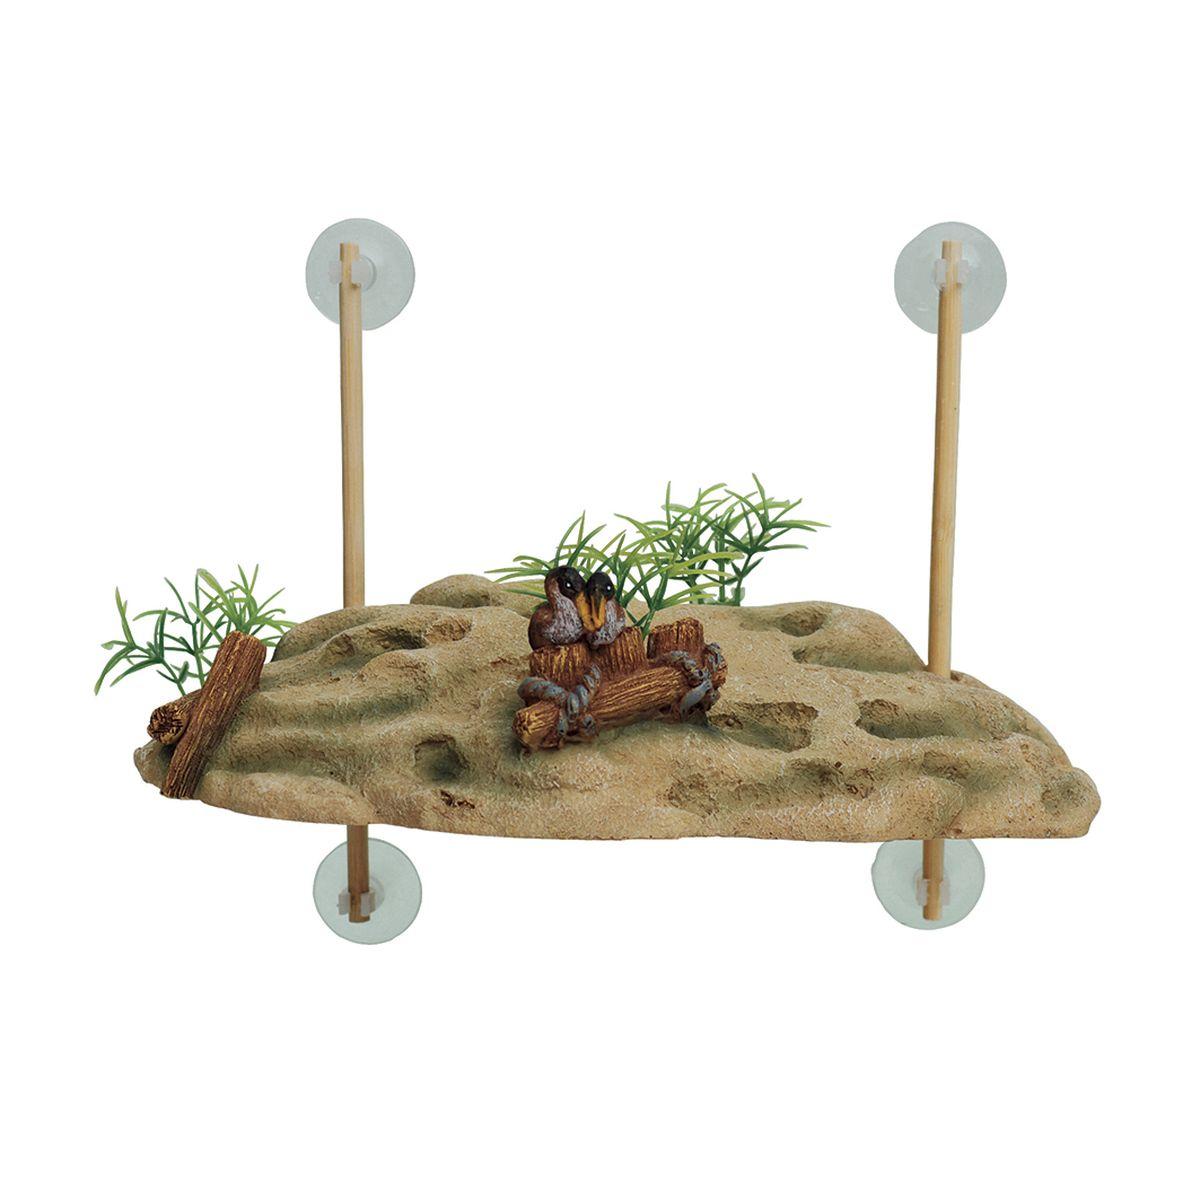 Декорация для аквариума ArtUniq Островок для черепах, на присосках, 24,5 x 11,5 x 7,5 см0120710Декорация для аквариума ArtUniq Островок для черепах, на присосках, 24,5 x 11,5 x 7,5 см